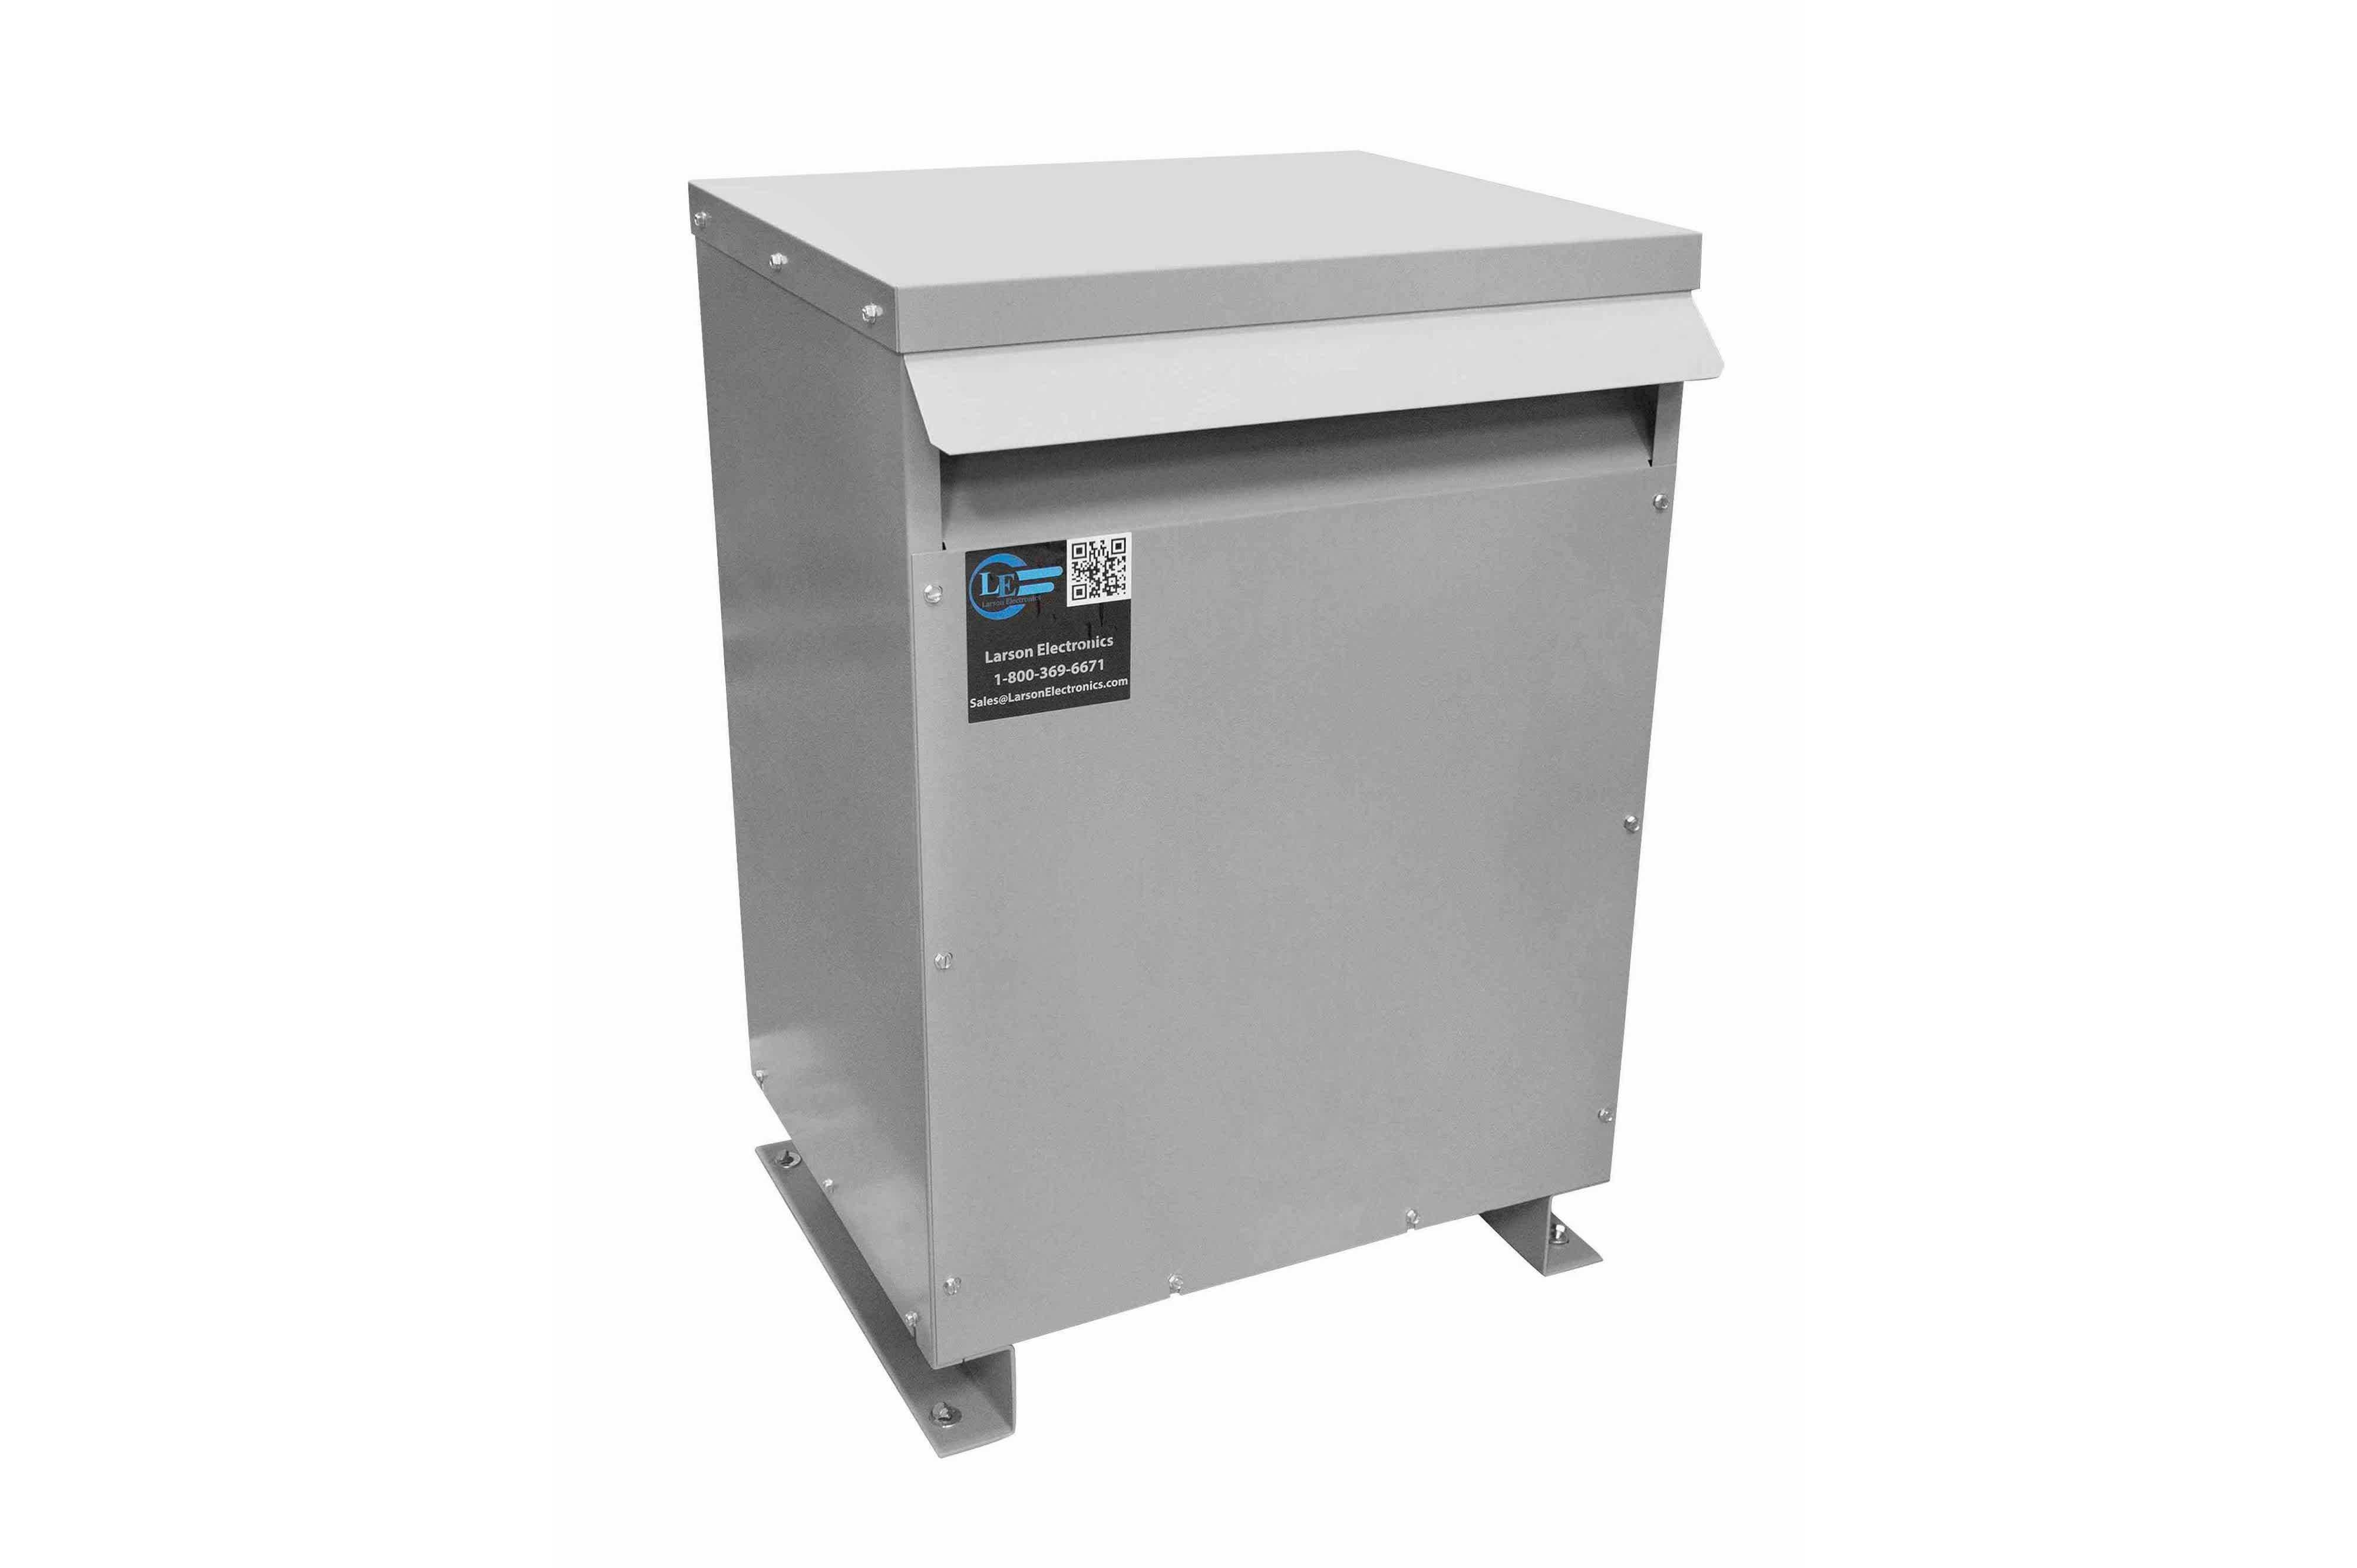 38 kVA 3PH Isolation Transformer, 460V Wye Primary, 380V Delta Secondary, N3R, Ventilated, 60 Hz